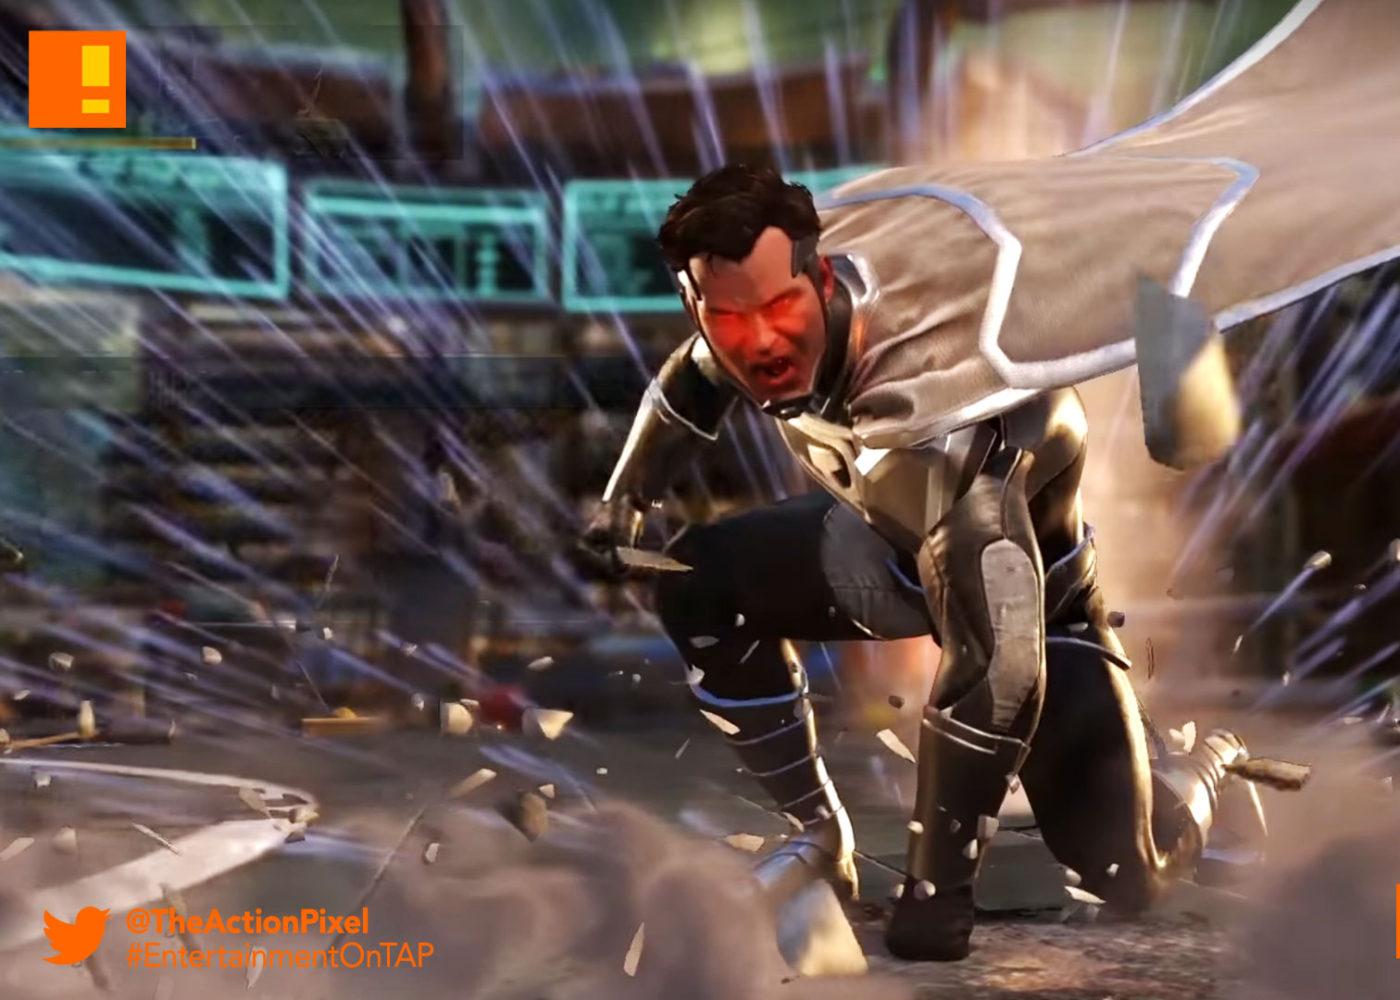 injustice 2, batman, gear, your battles your way, superman, injustice 2, injustice,dc comics, netherrealm studios, dc entertainment , warner bros.,